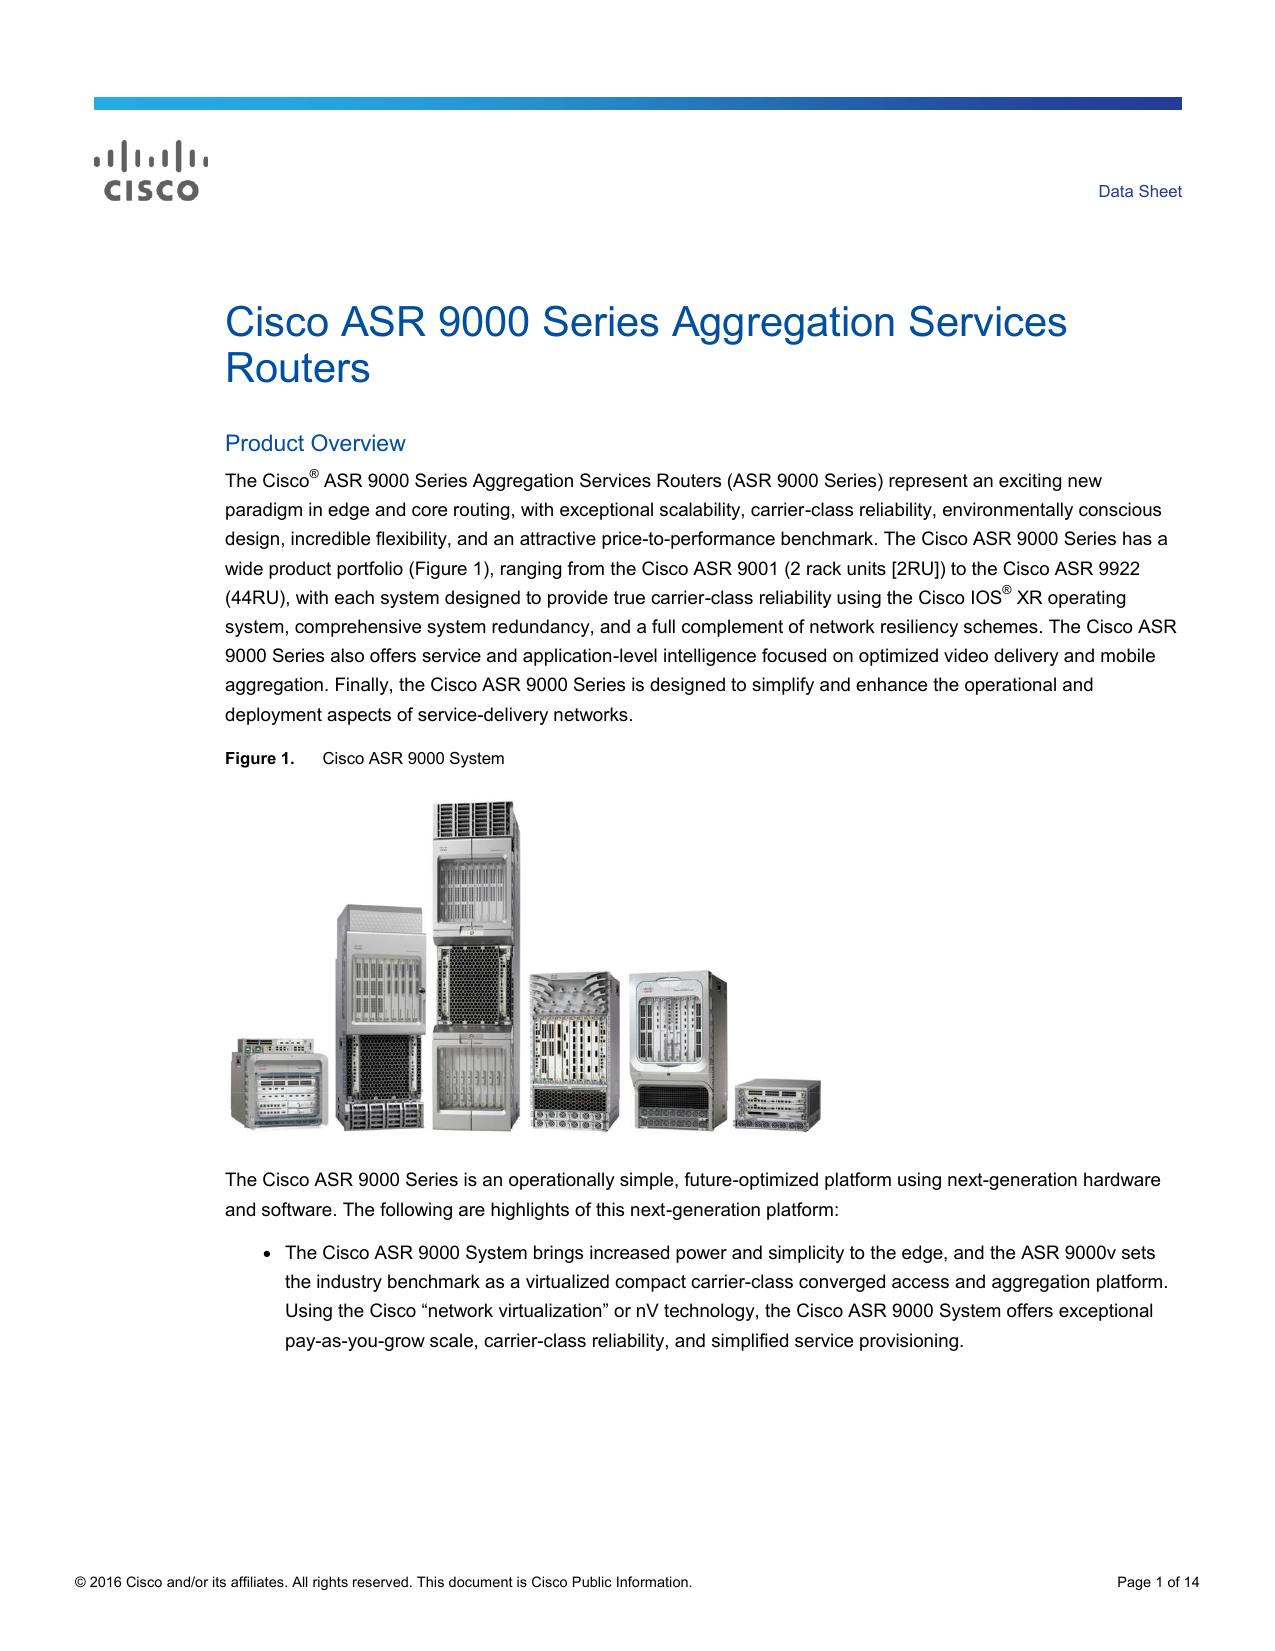 Cisco ASR 9000 Series Aggregation Services Routers